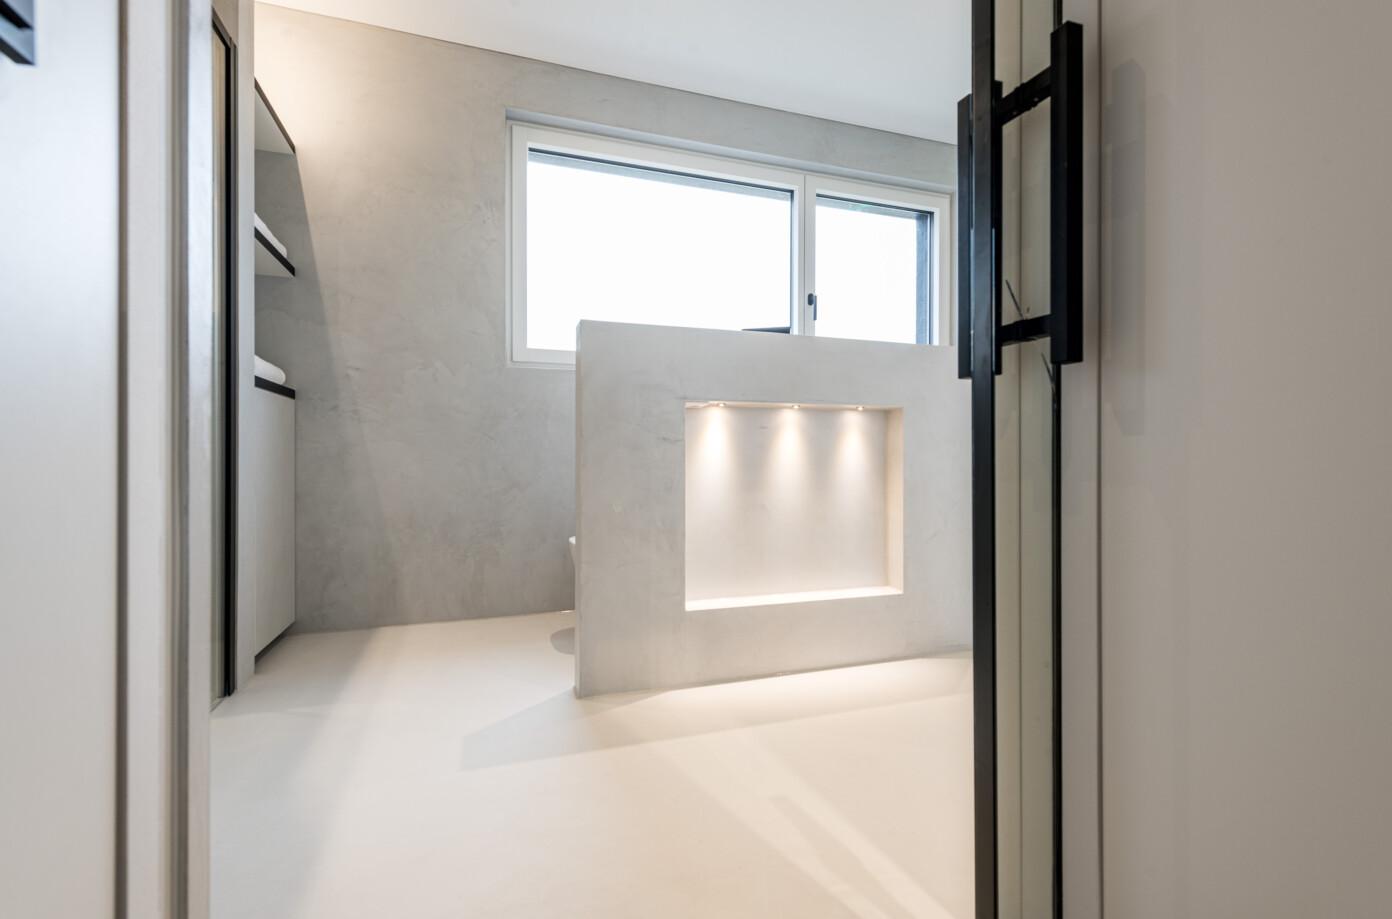 Wb design bodenbeschichtungnassbereich bathinglounge 001